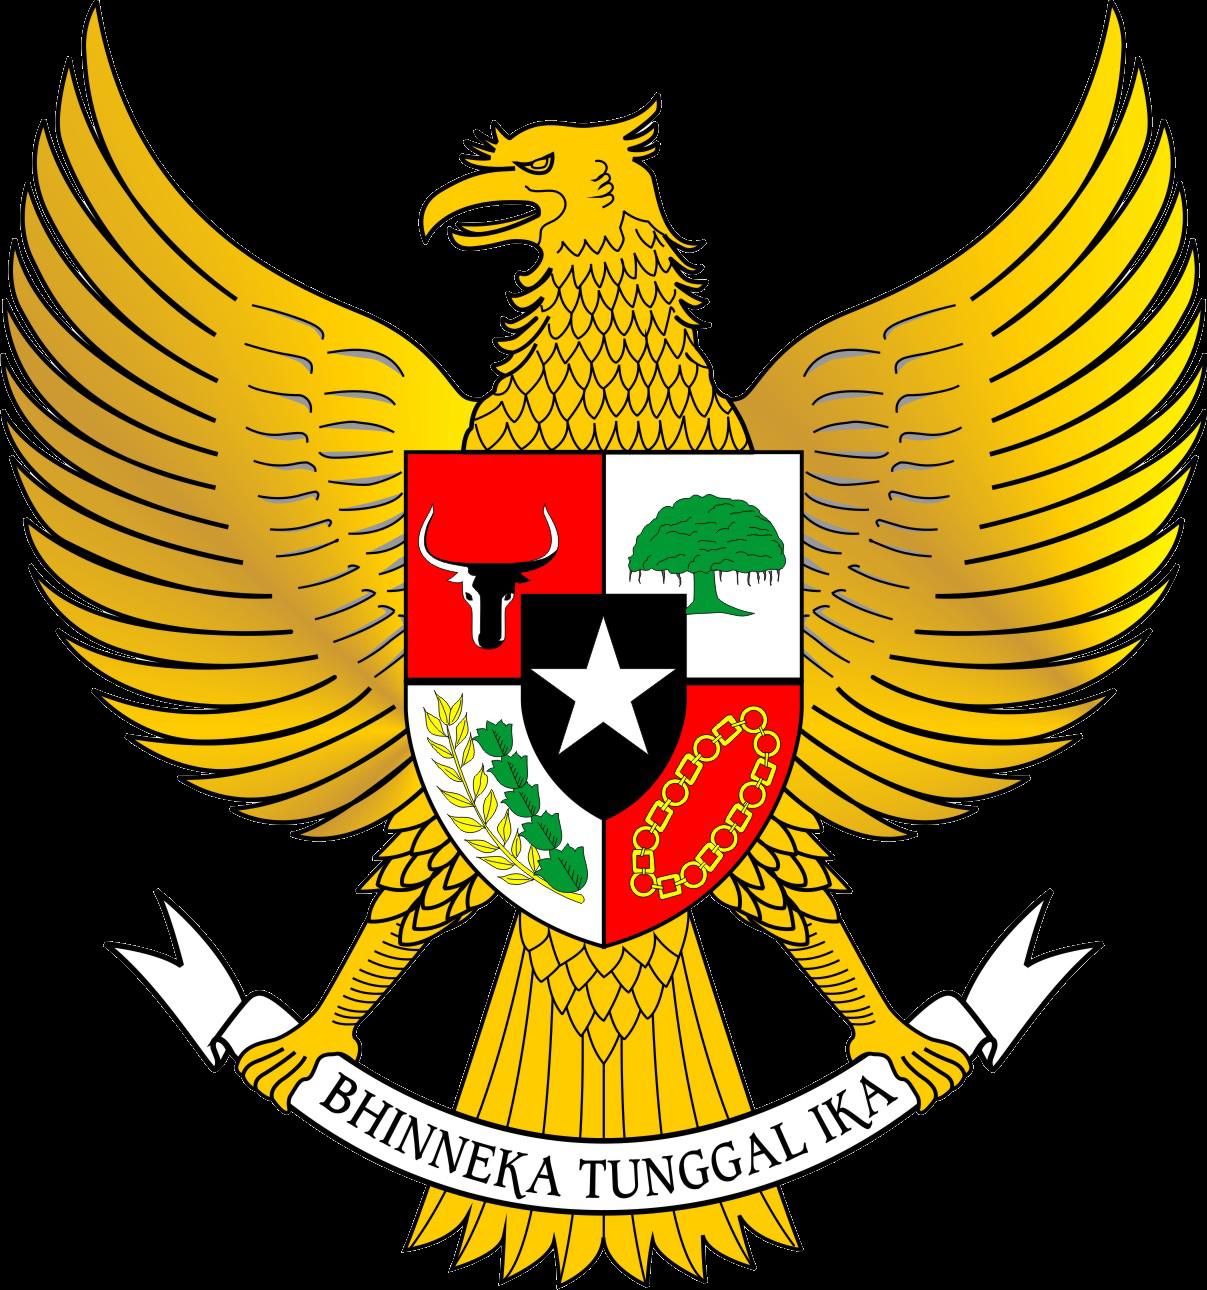 Garuda, Purna Paskibraka Indonesia